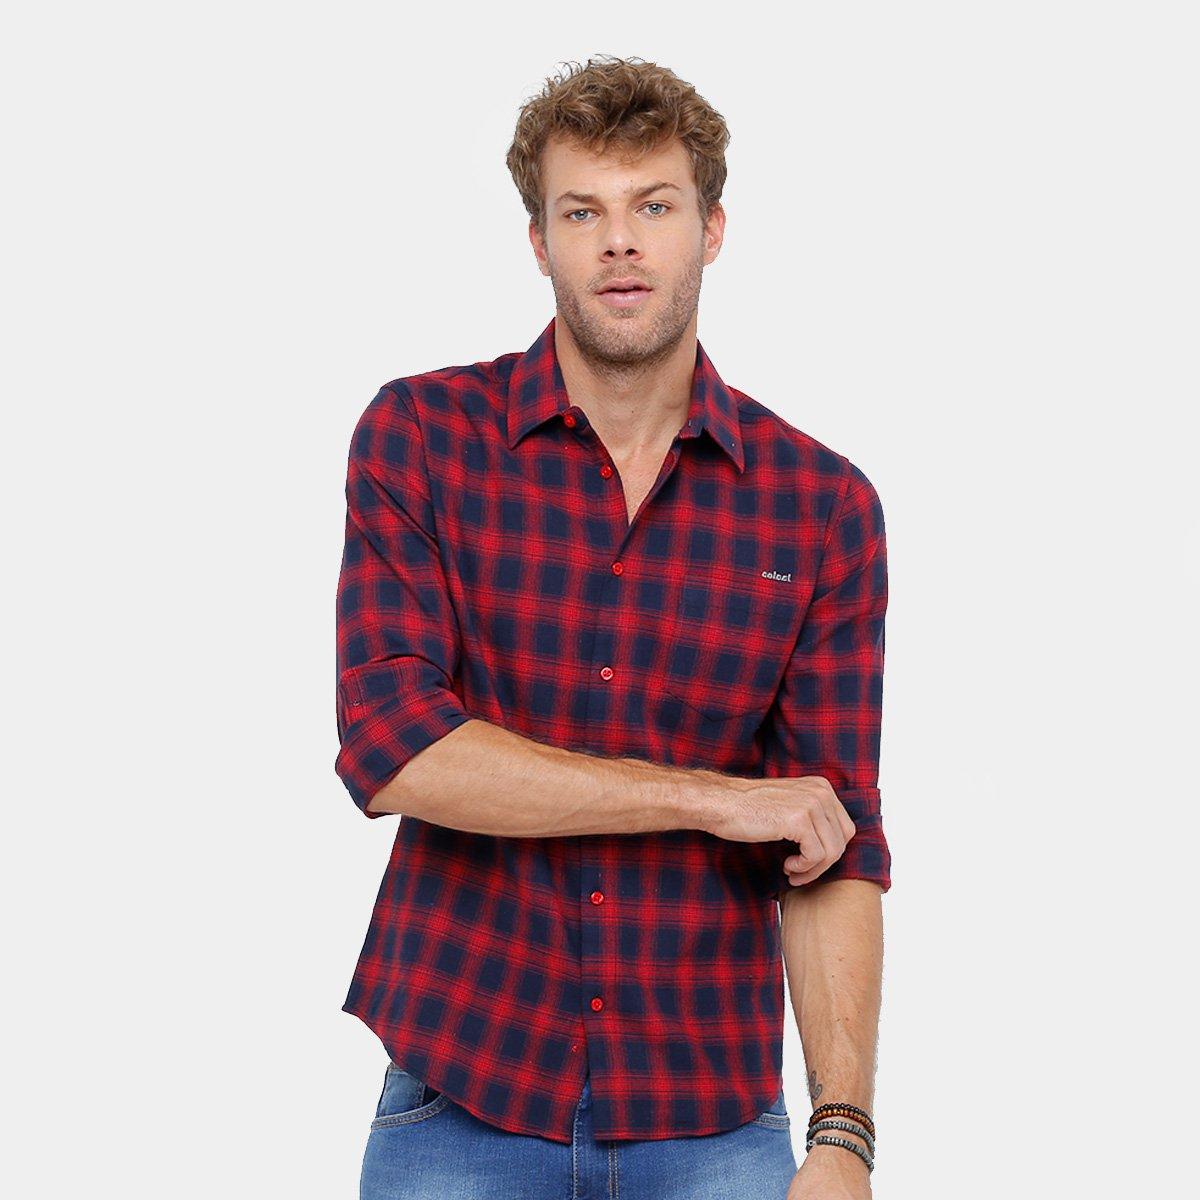 37b35ed6f15fc Camisa Xadrez Colcci Masculina - Compre Agora